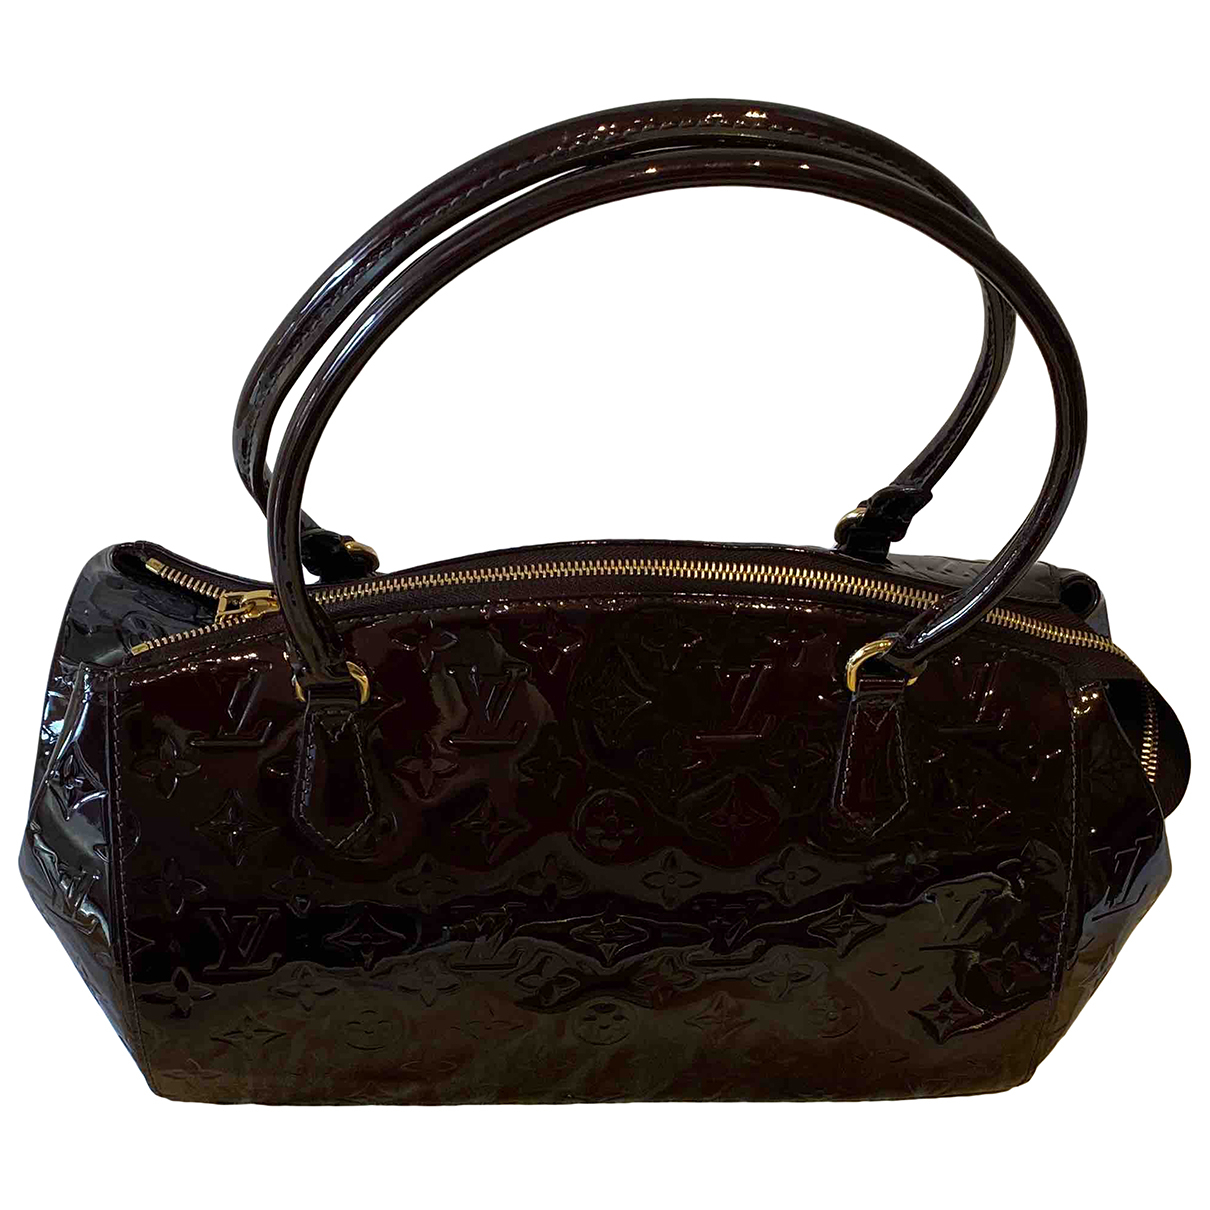 Louis Vuitton Sherwood Handtasche in  Bordeauxrot Leder